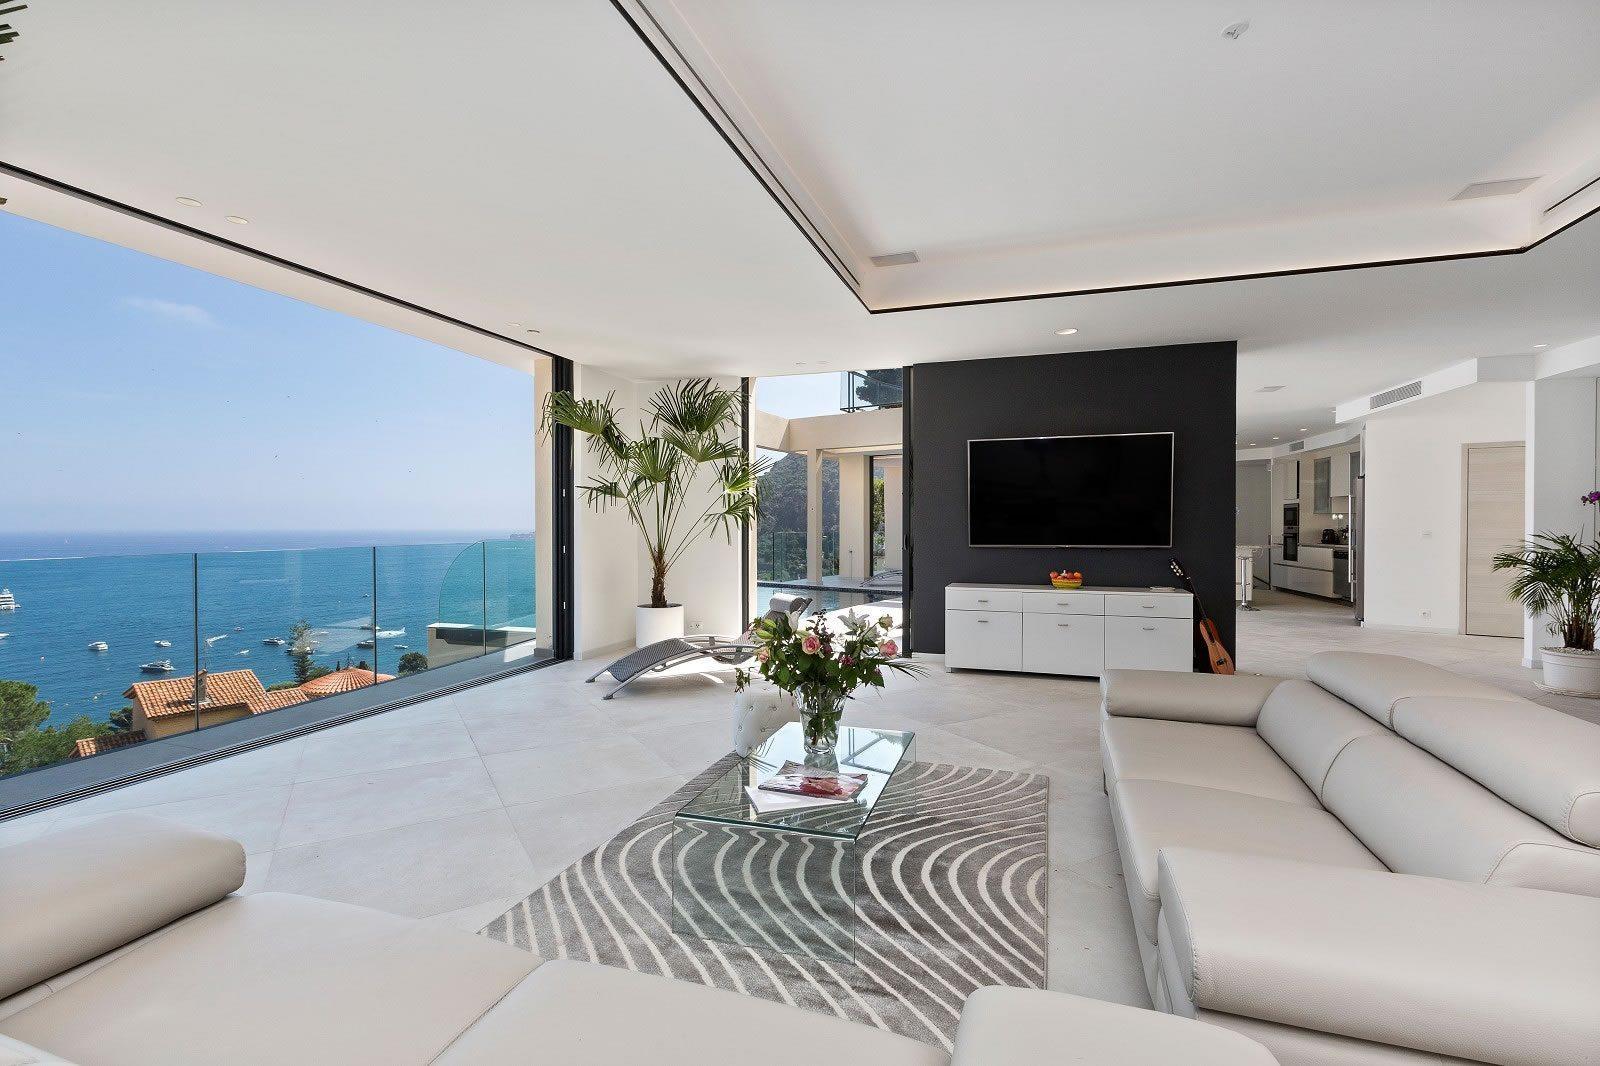 villa-grand-luxe-piscine-sublime-vue-mer-a-louer-eze-terrasse